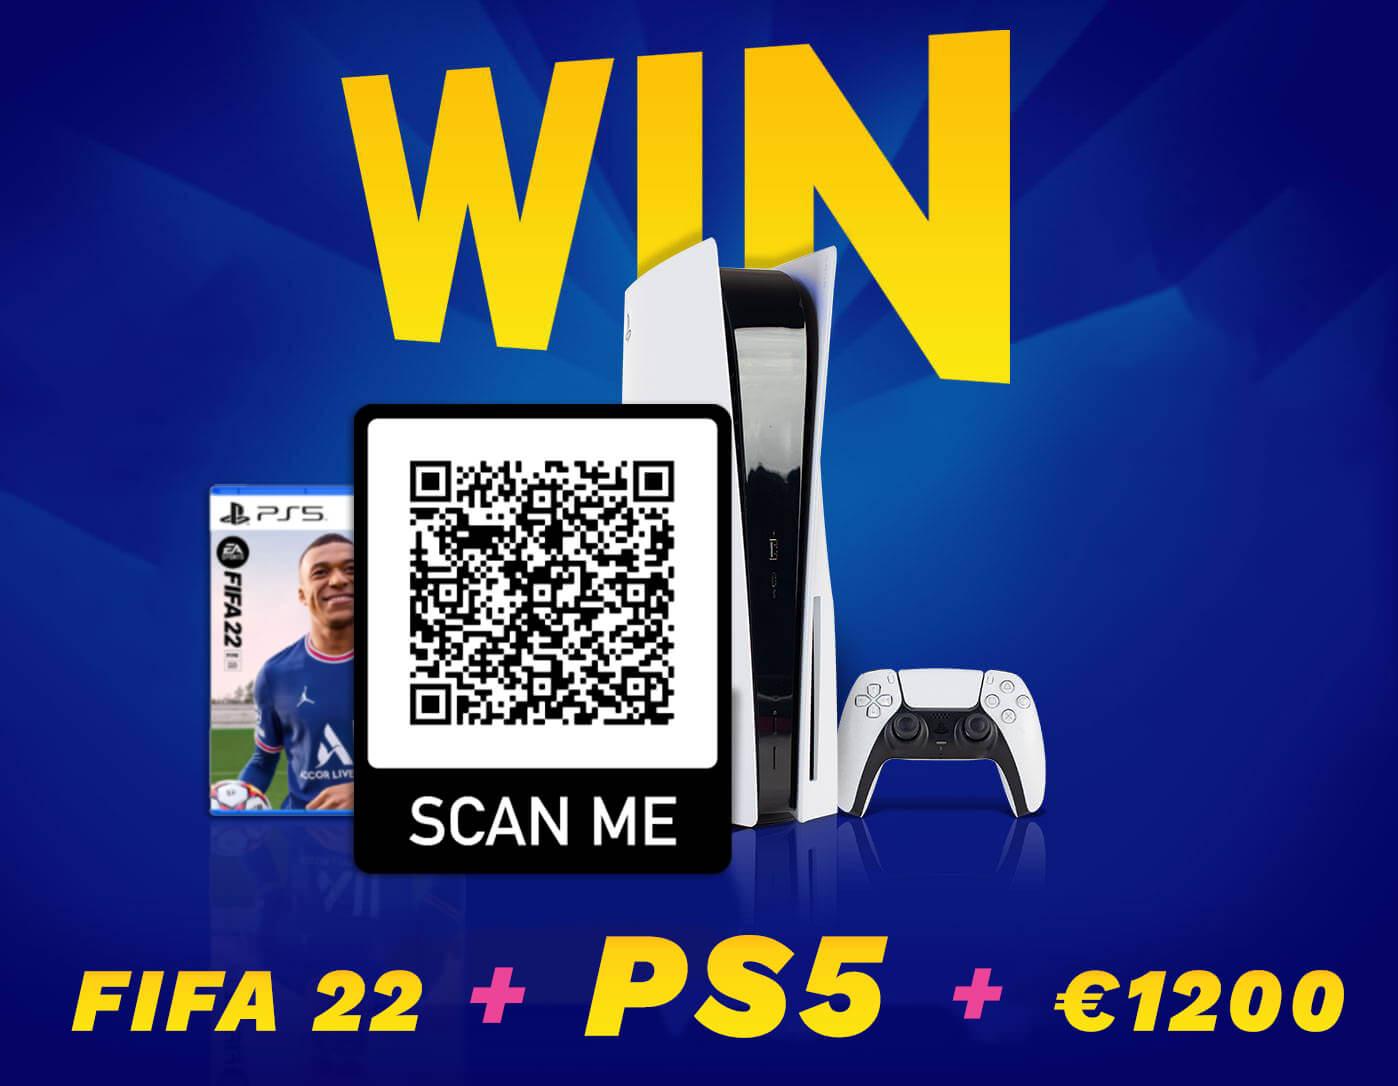 Win-a-PS5-promo-event.jpg